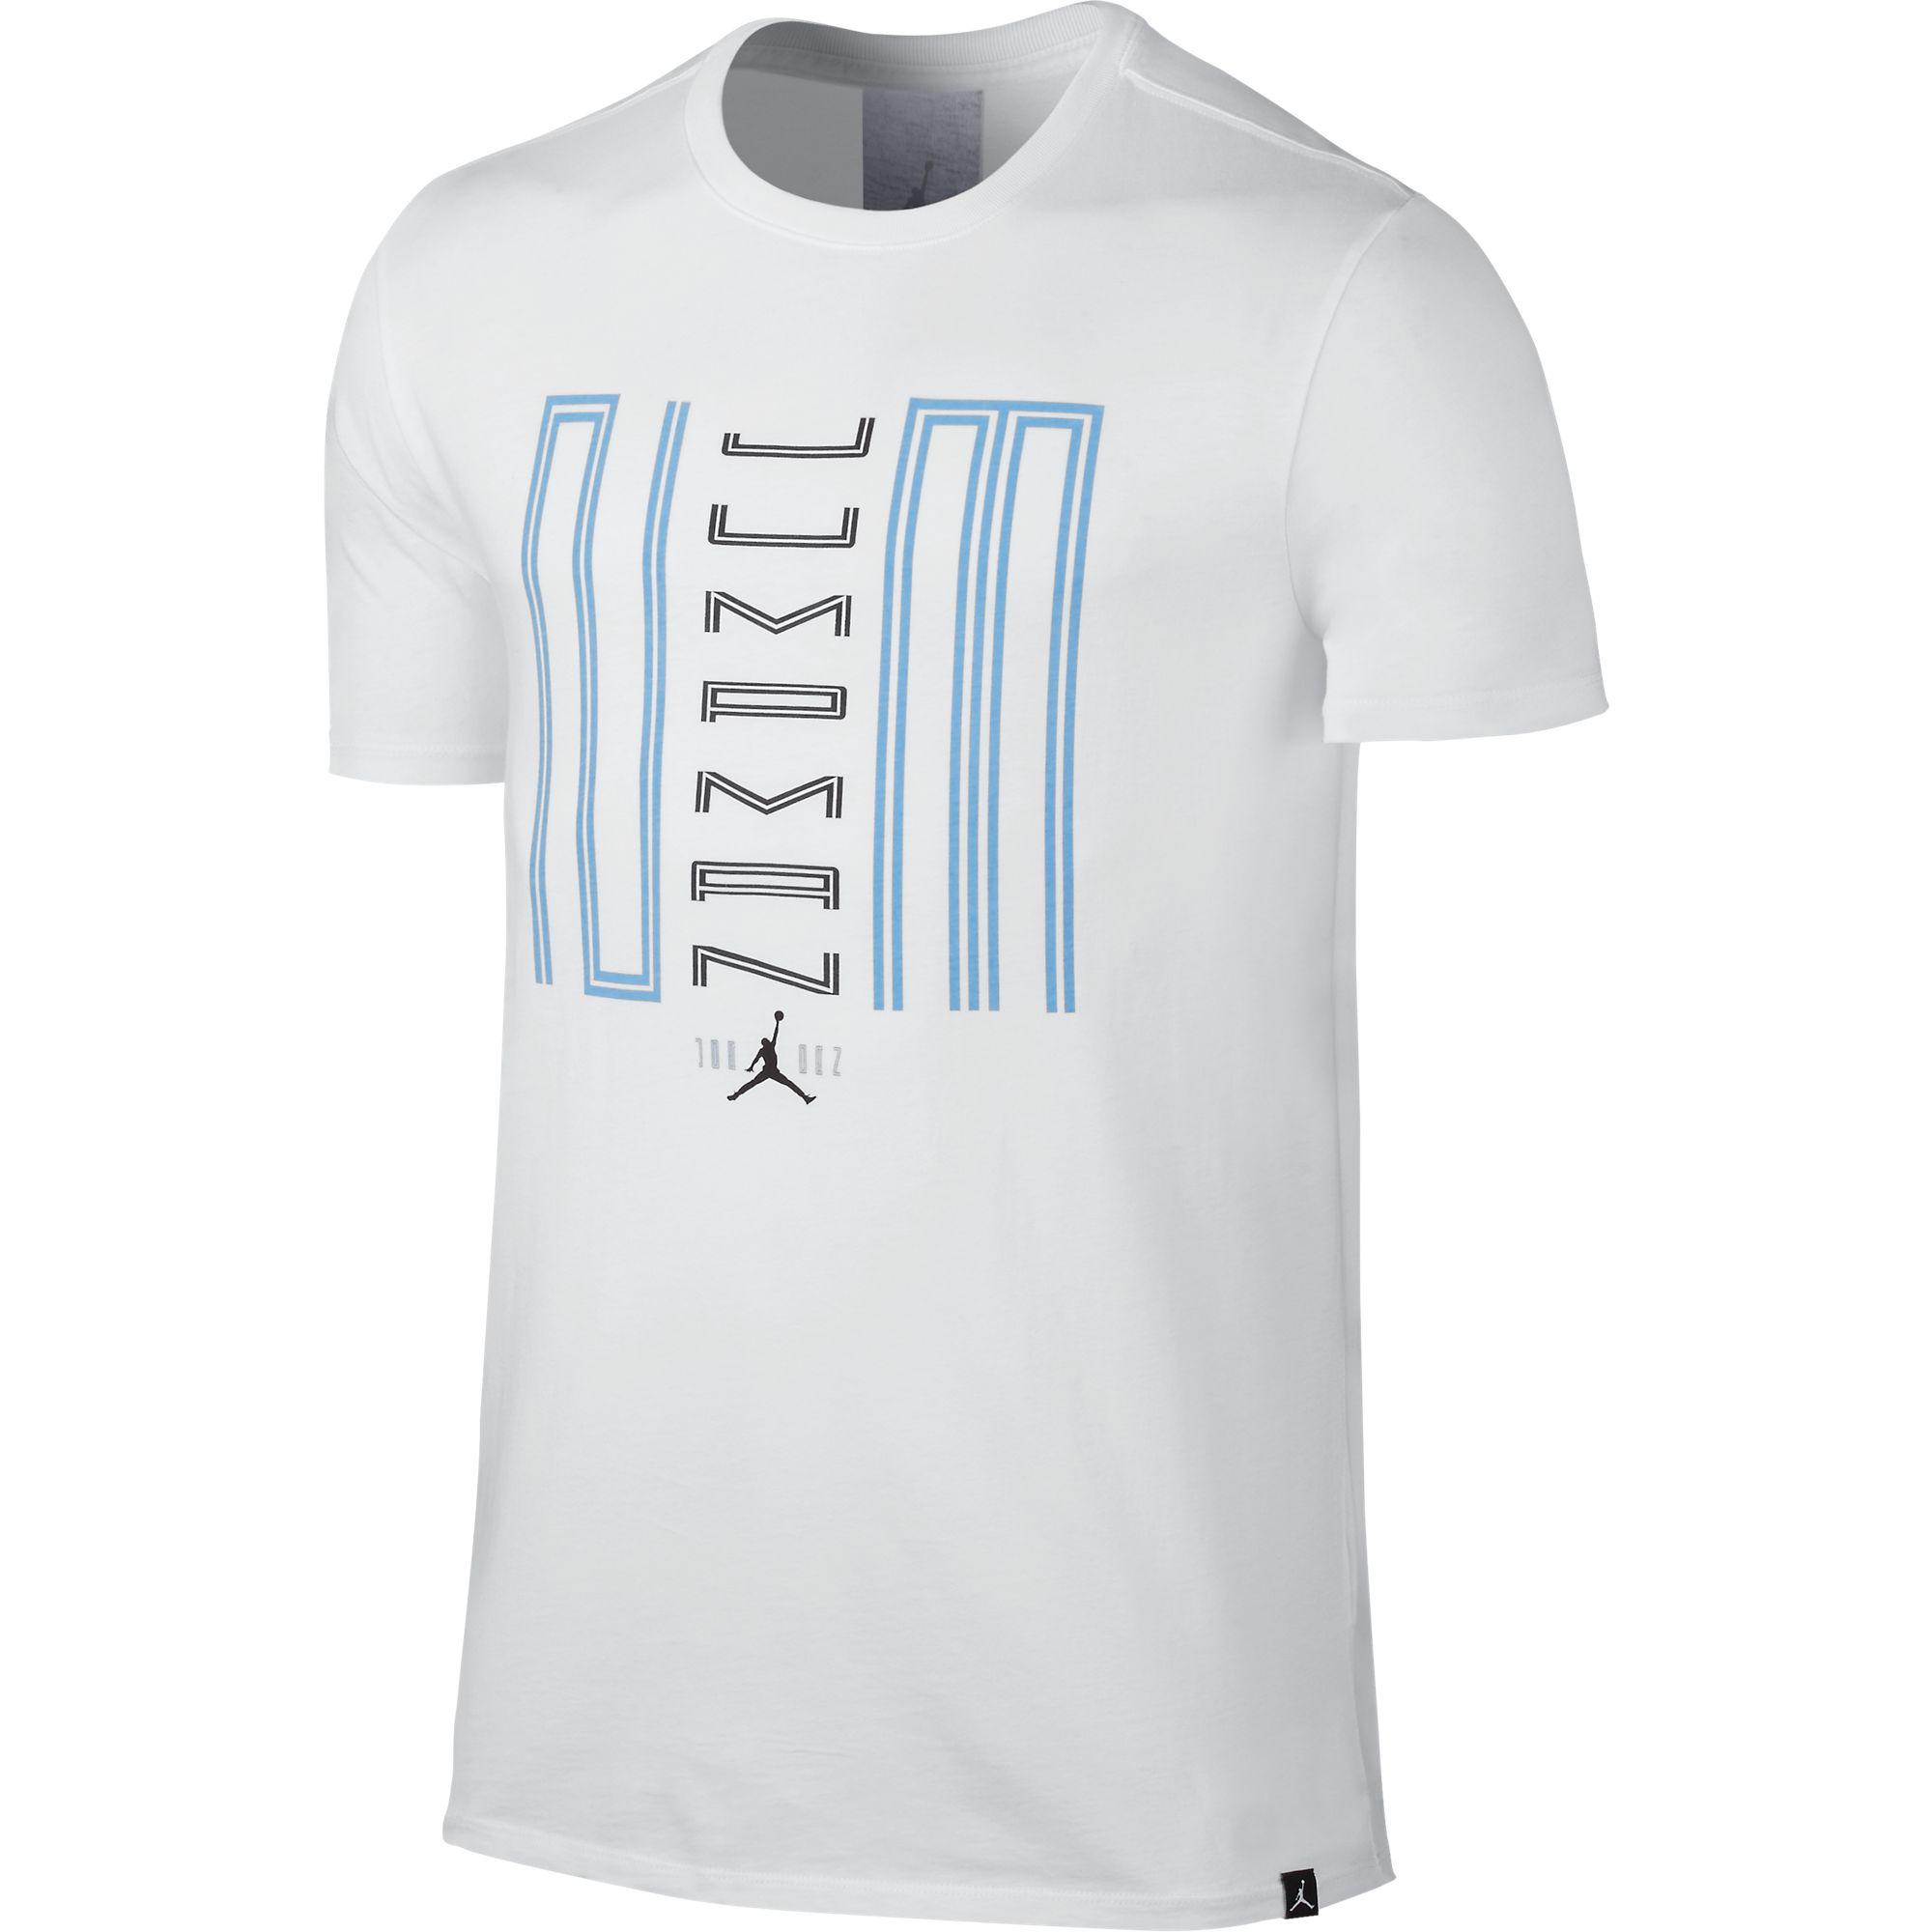 Nike 11 Jumpman 23 Men's Sportswear Casual T-Shirt White/...